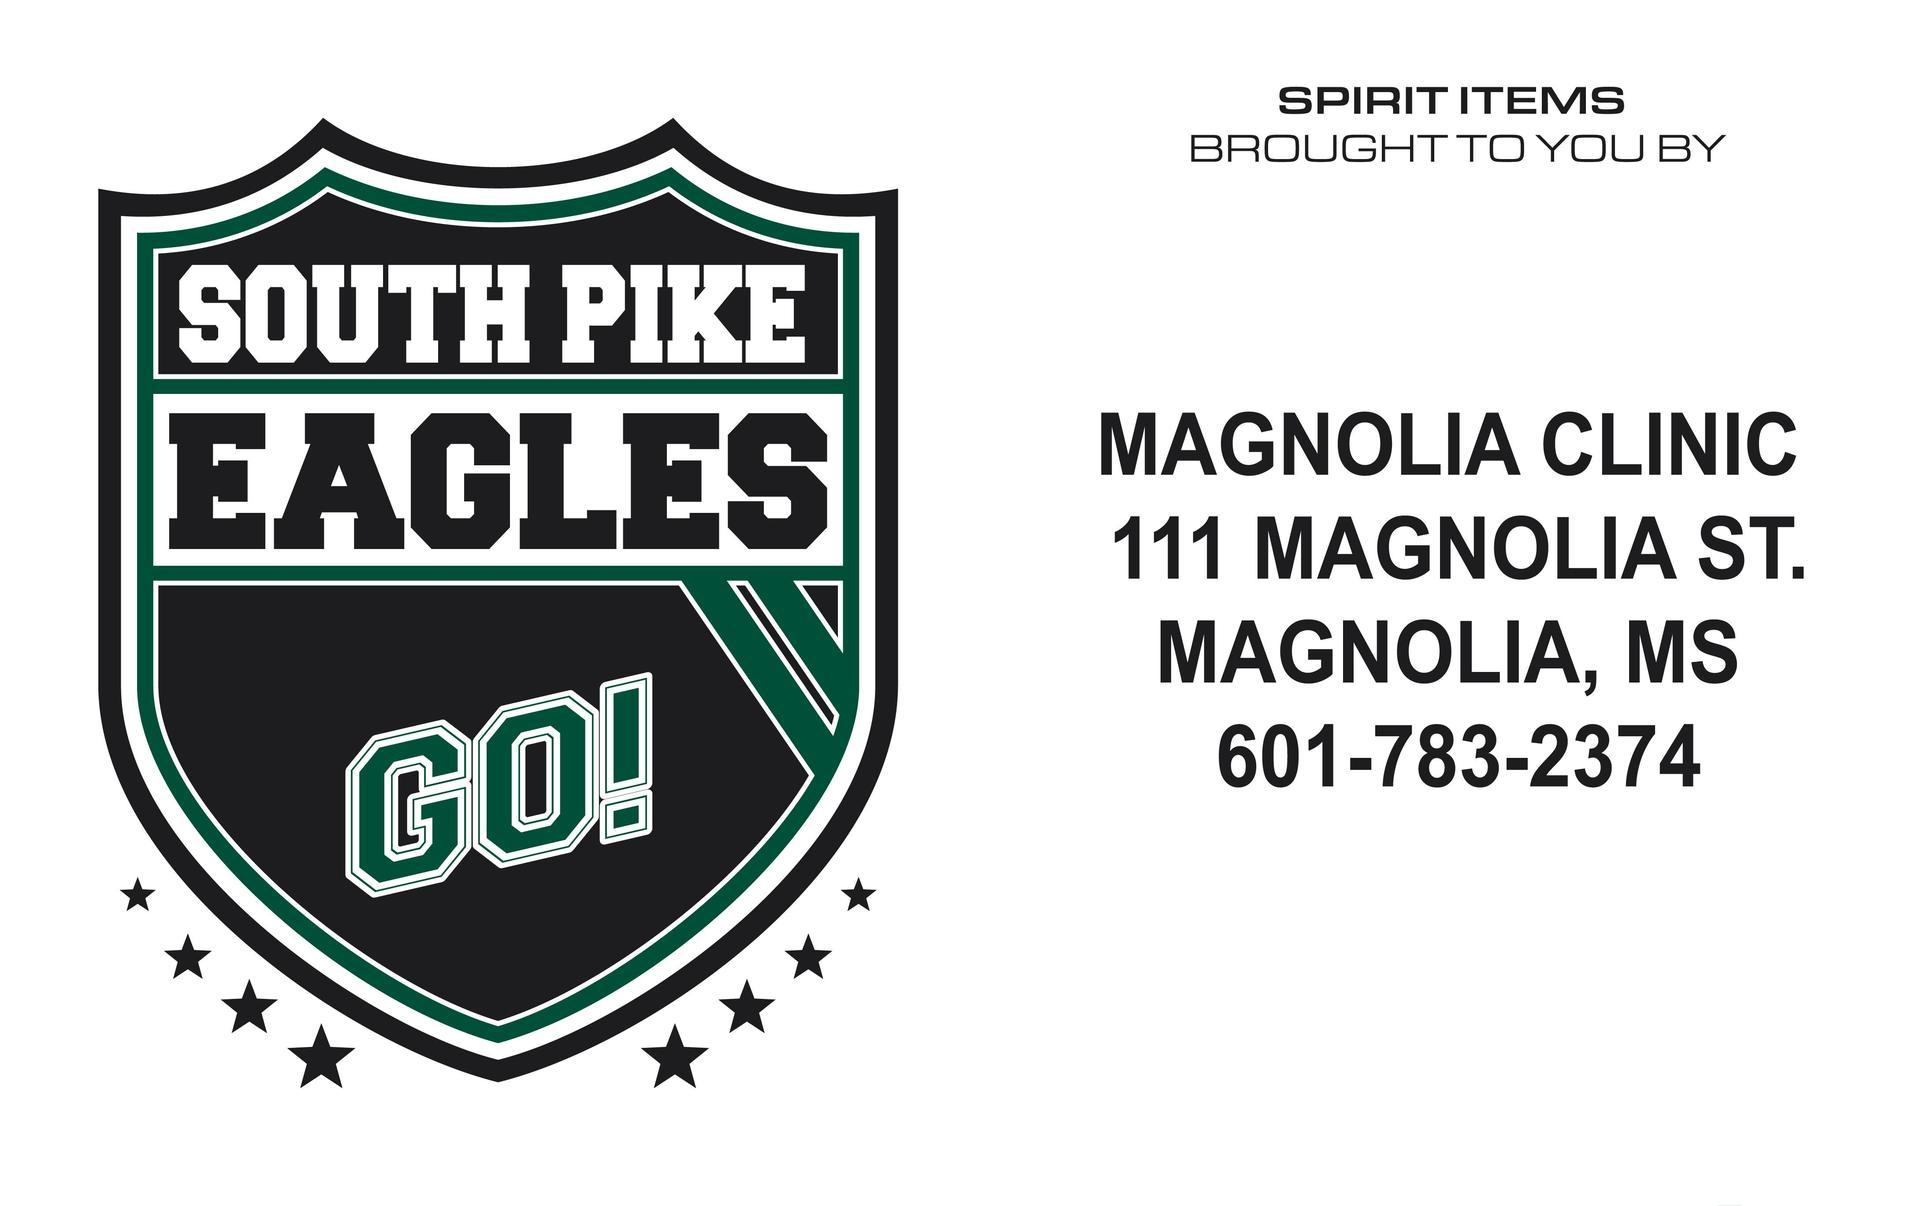 Magnolia Clinic